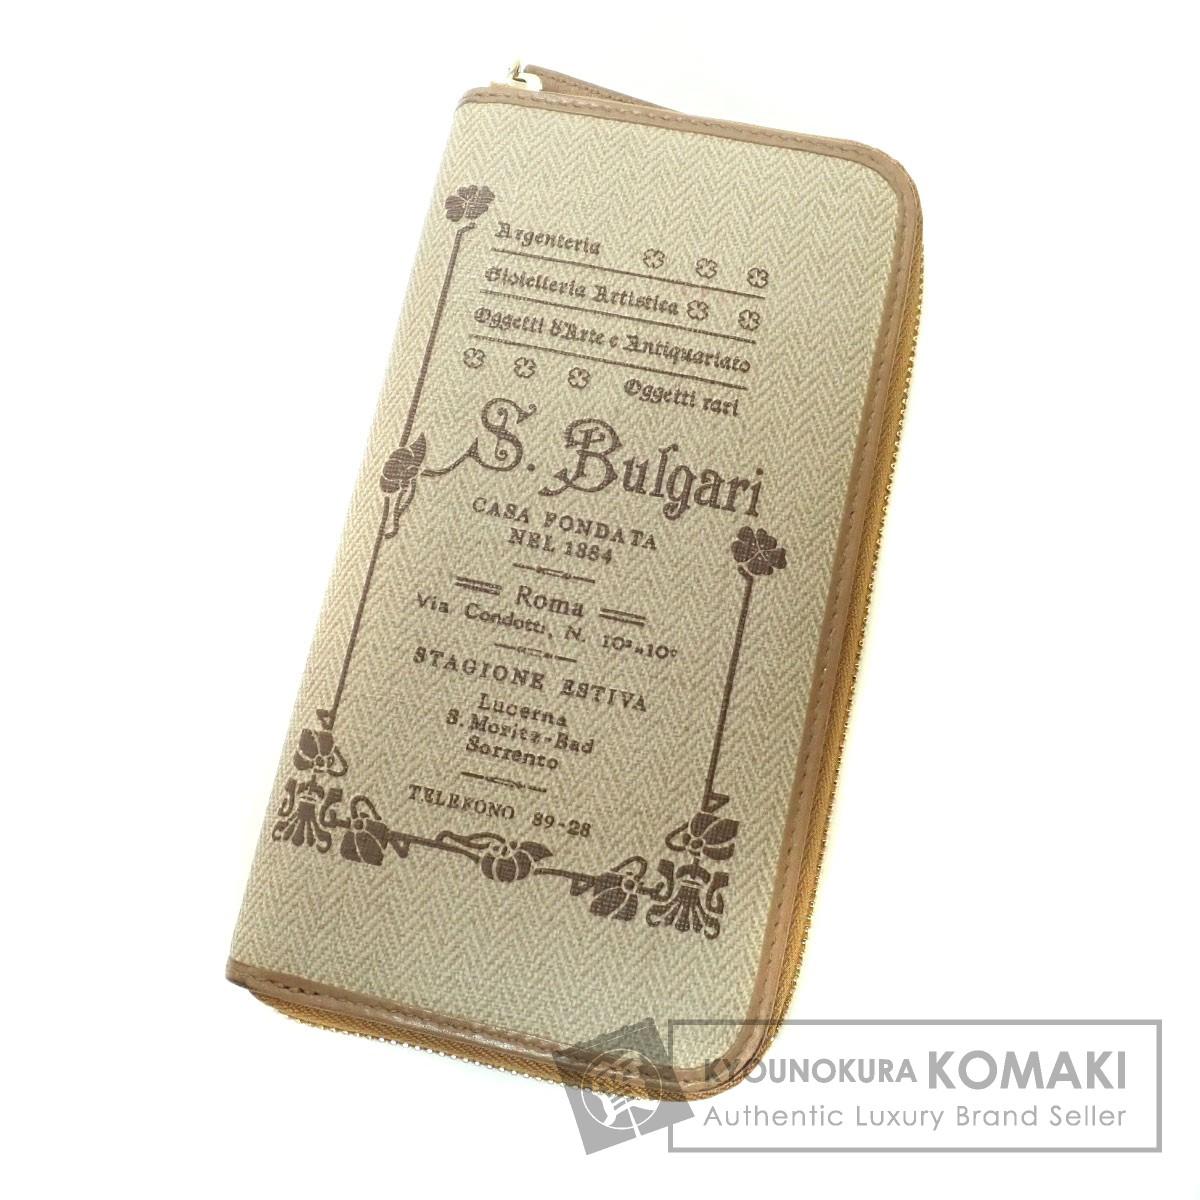 BVLGARI ロゴモチーフ 長財布(小銭入れあり) PVC レディース 【中古】【ブルガリ】